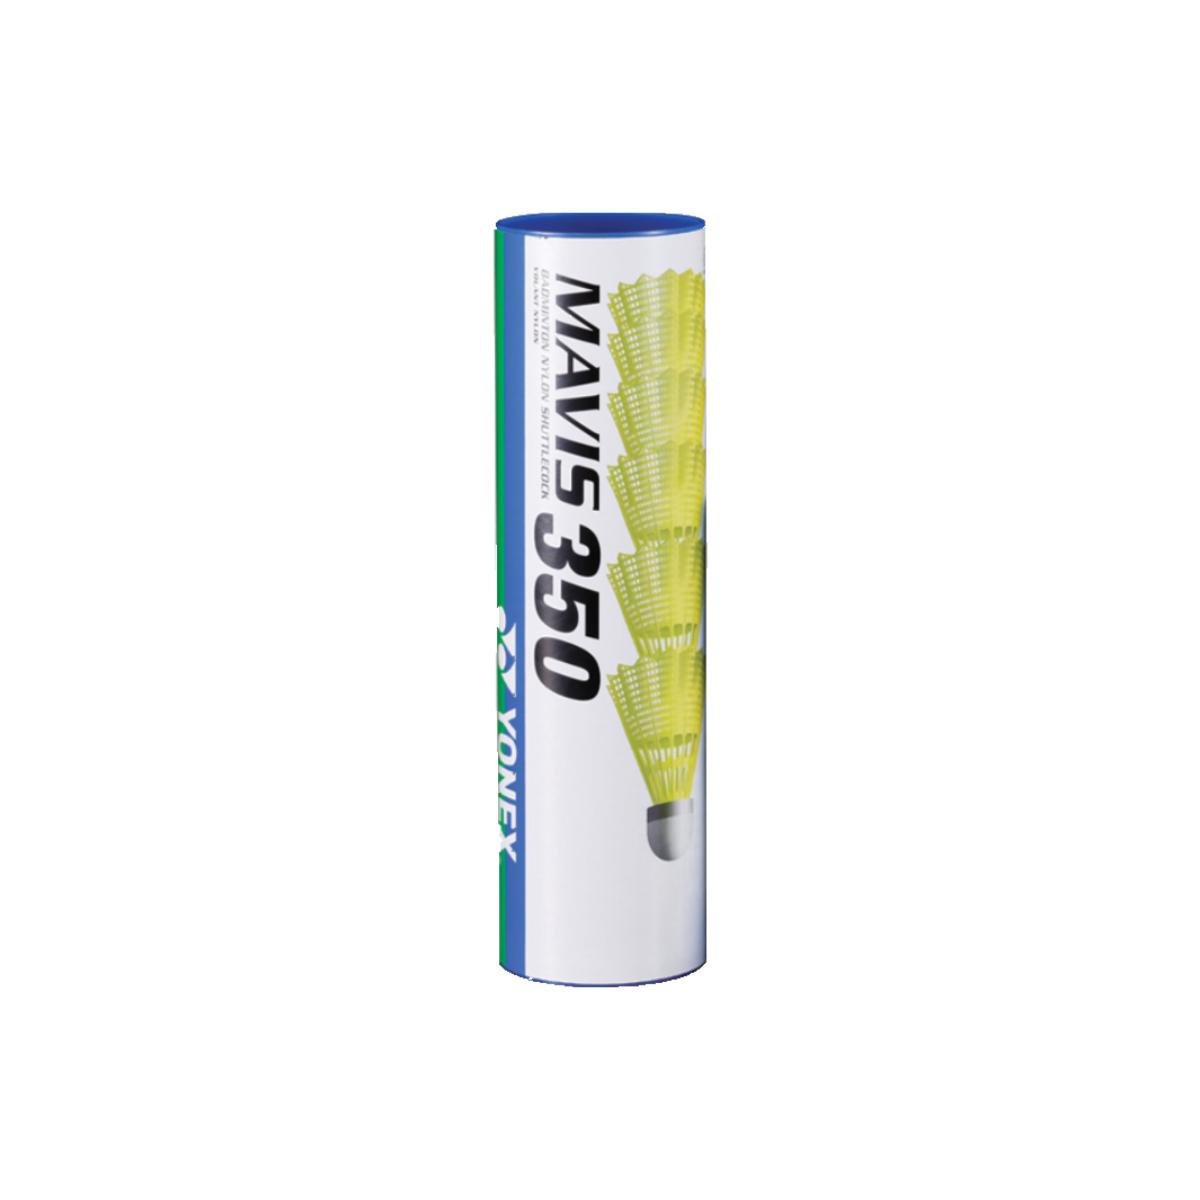 YONEX - Nylonfederball MAVIS-350Detailbild - 0